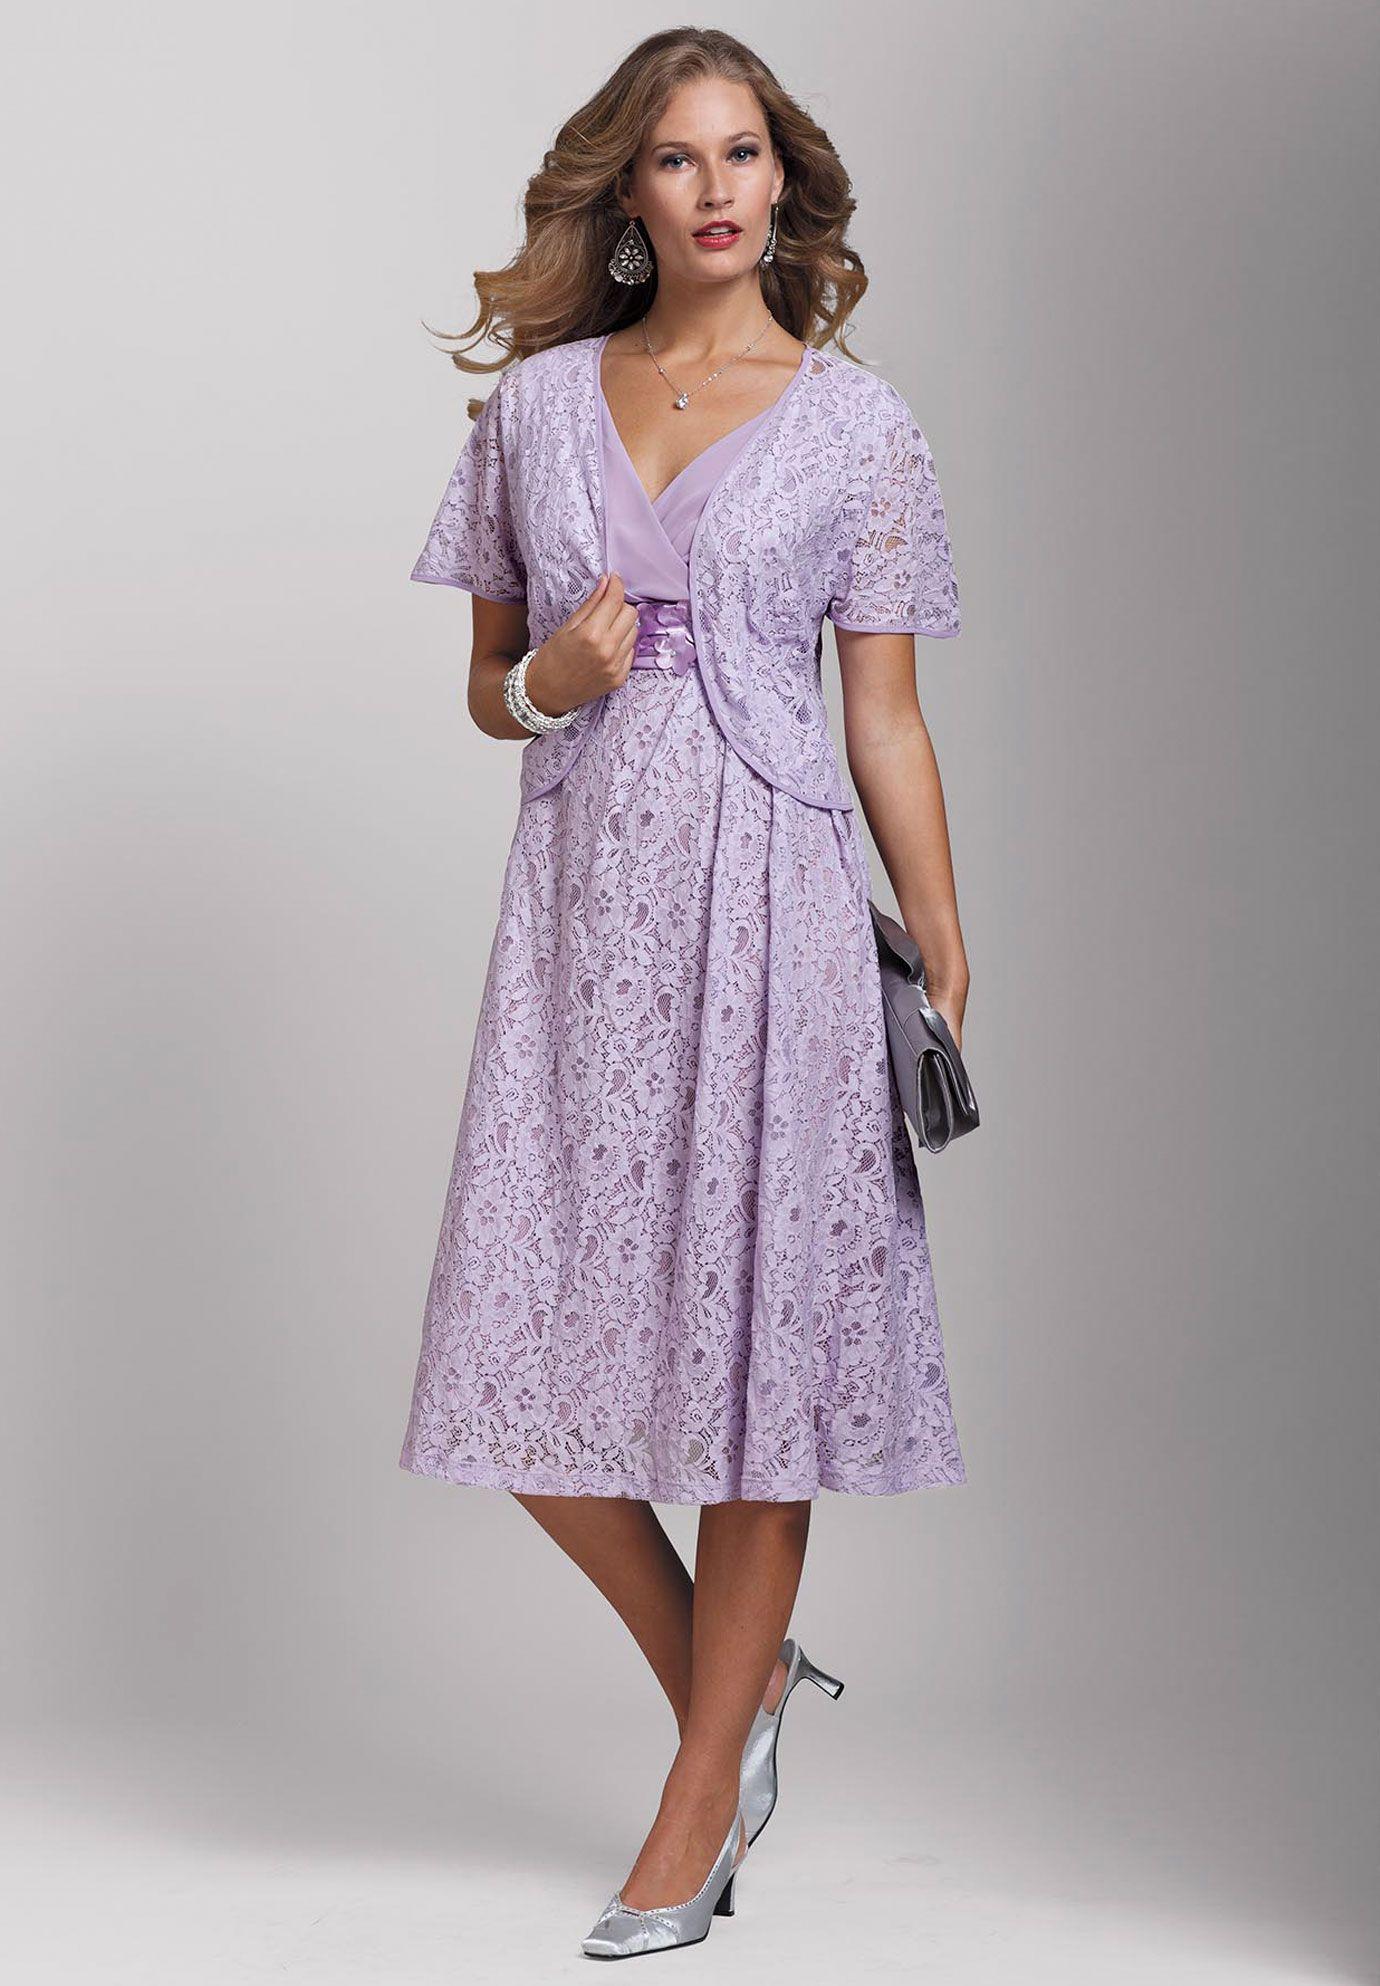 Plus Size Lace Bolero Jacket Dress Plus Size Special Occasion